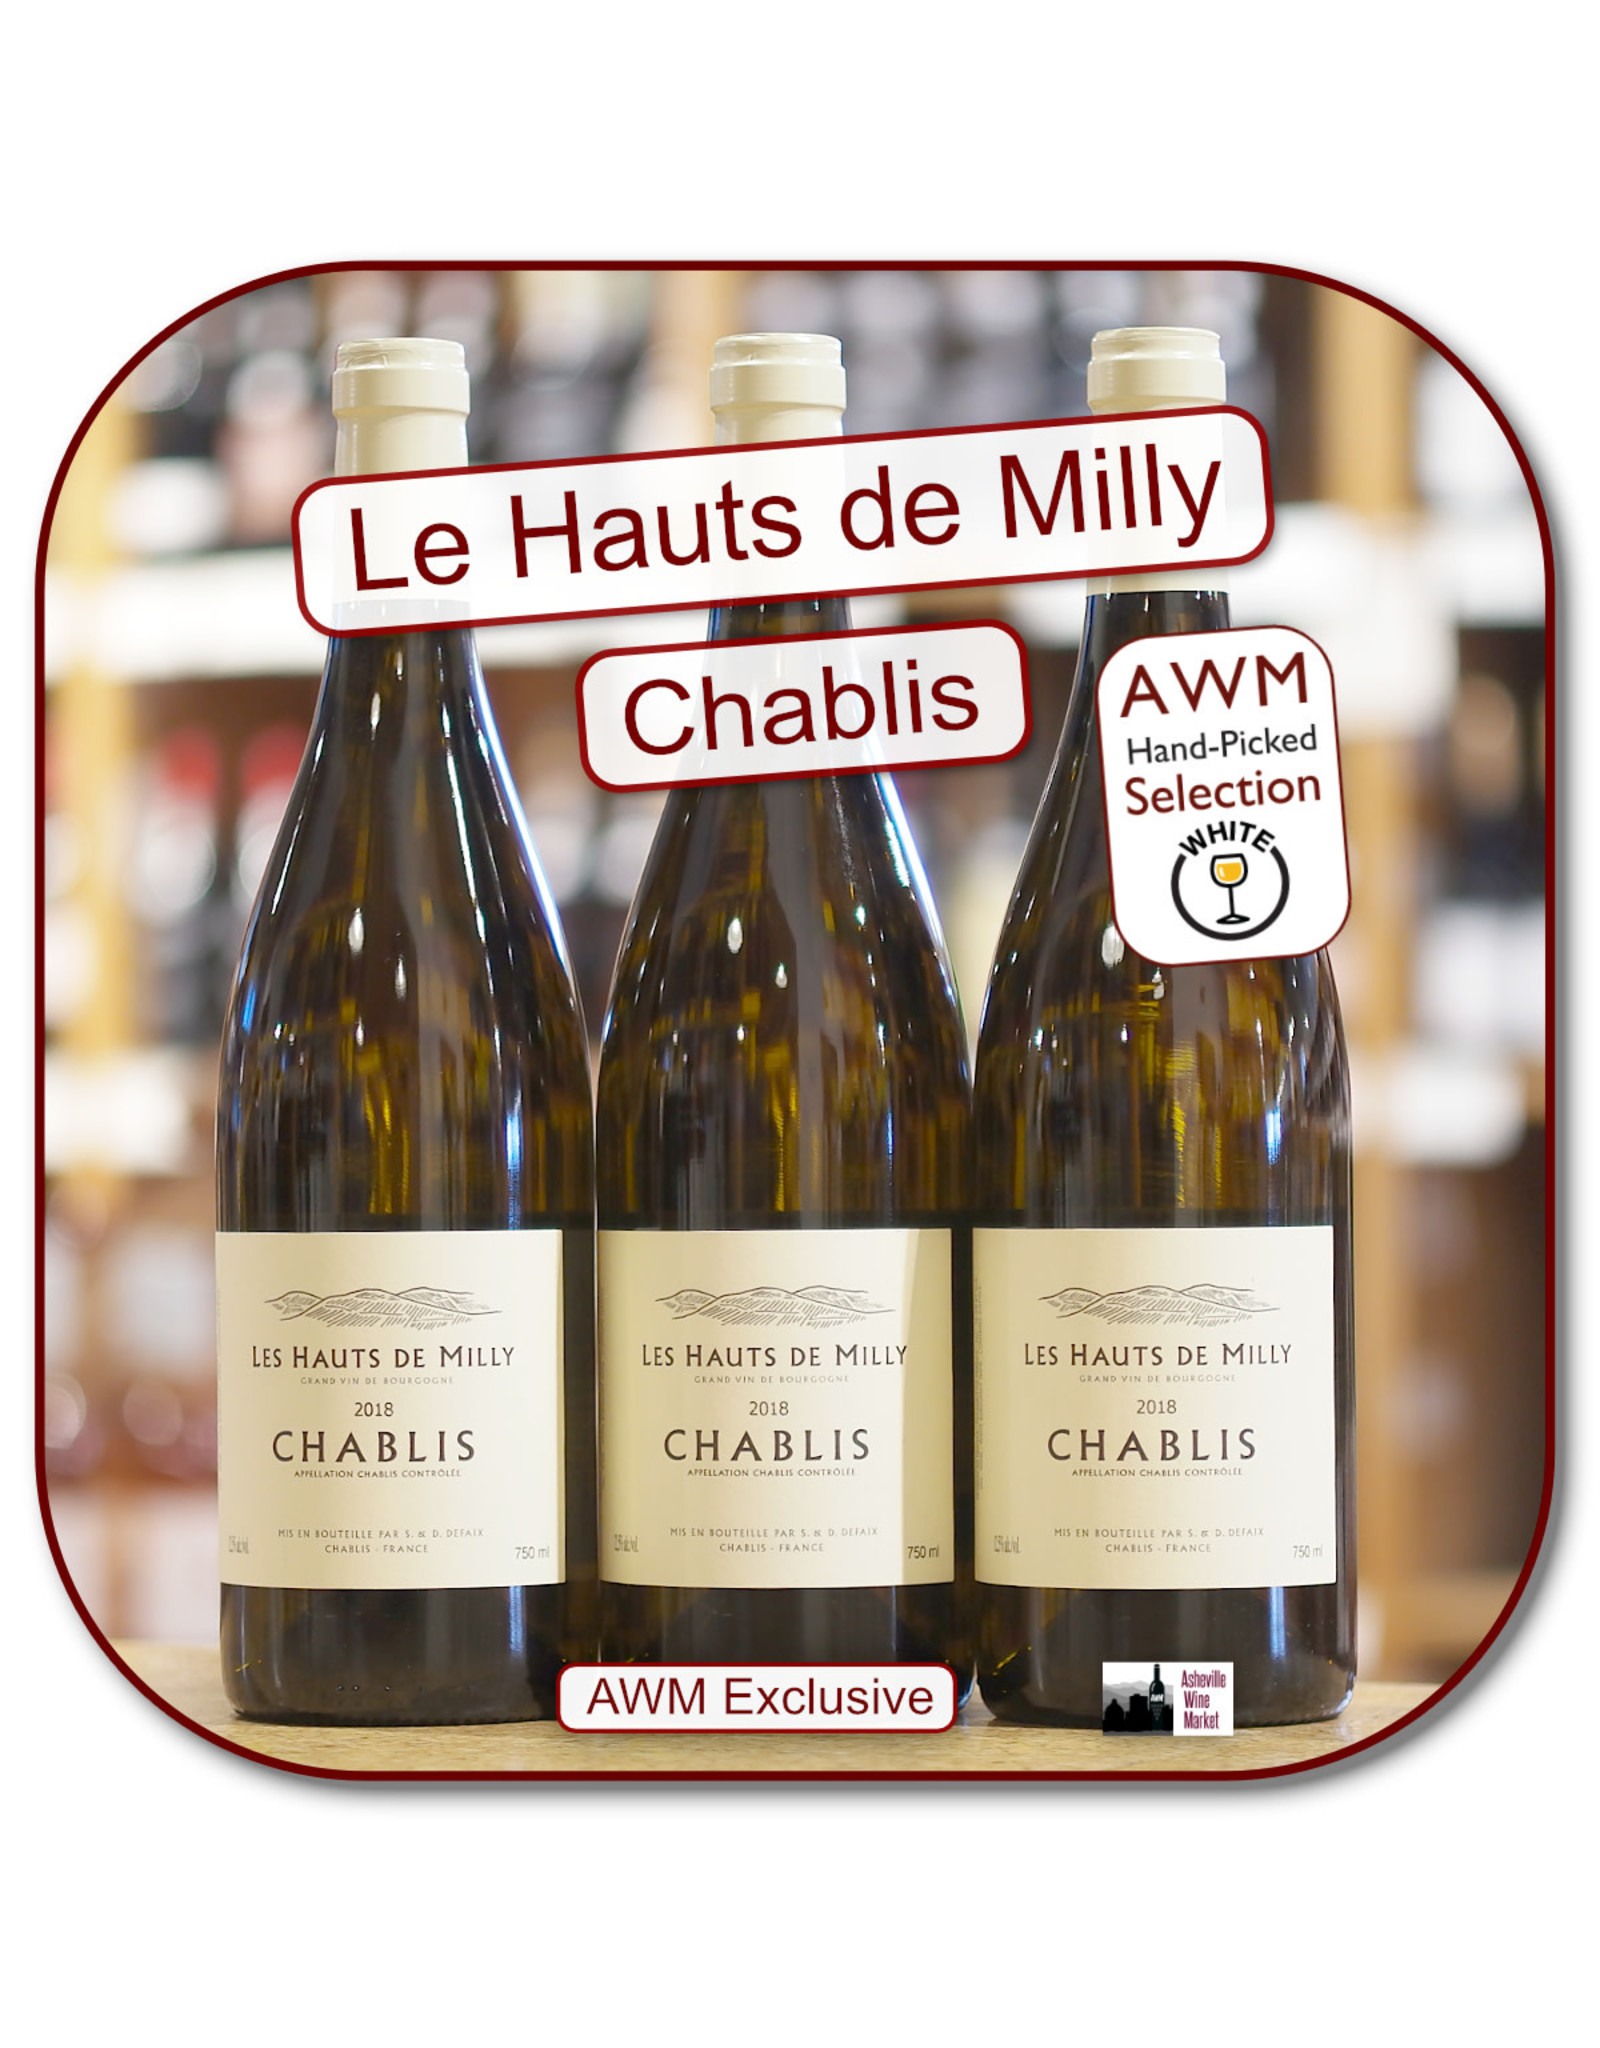 Chardonnay Hauts Milly Chablis 18